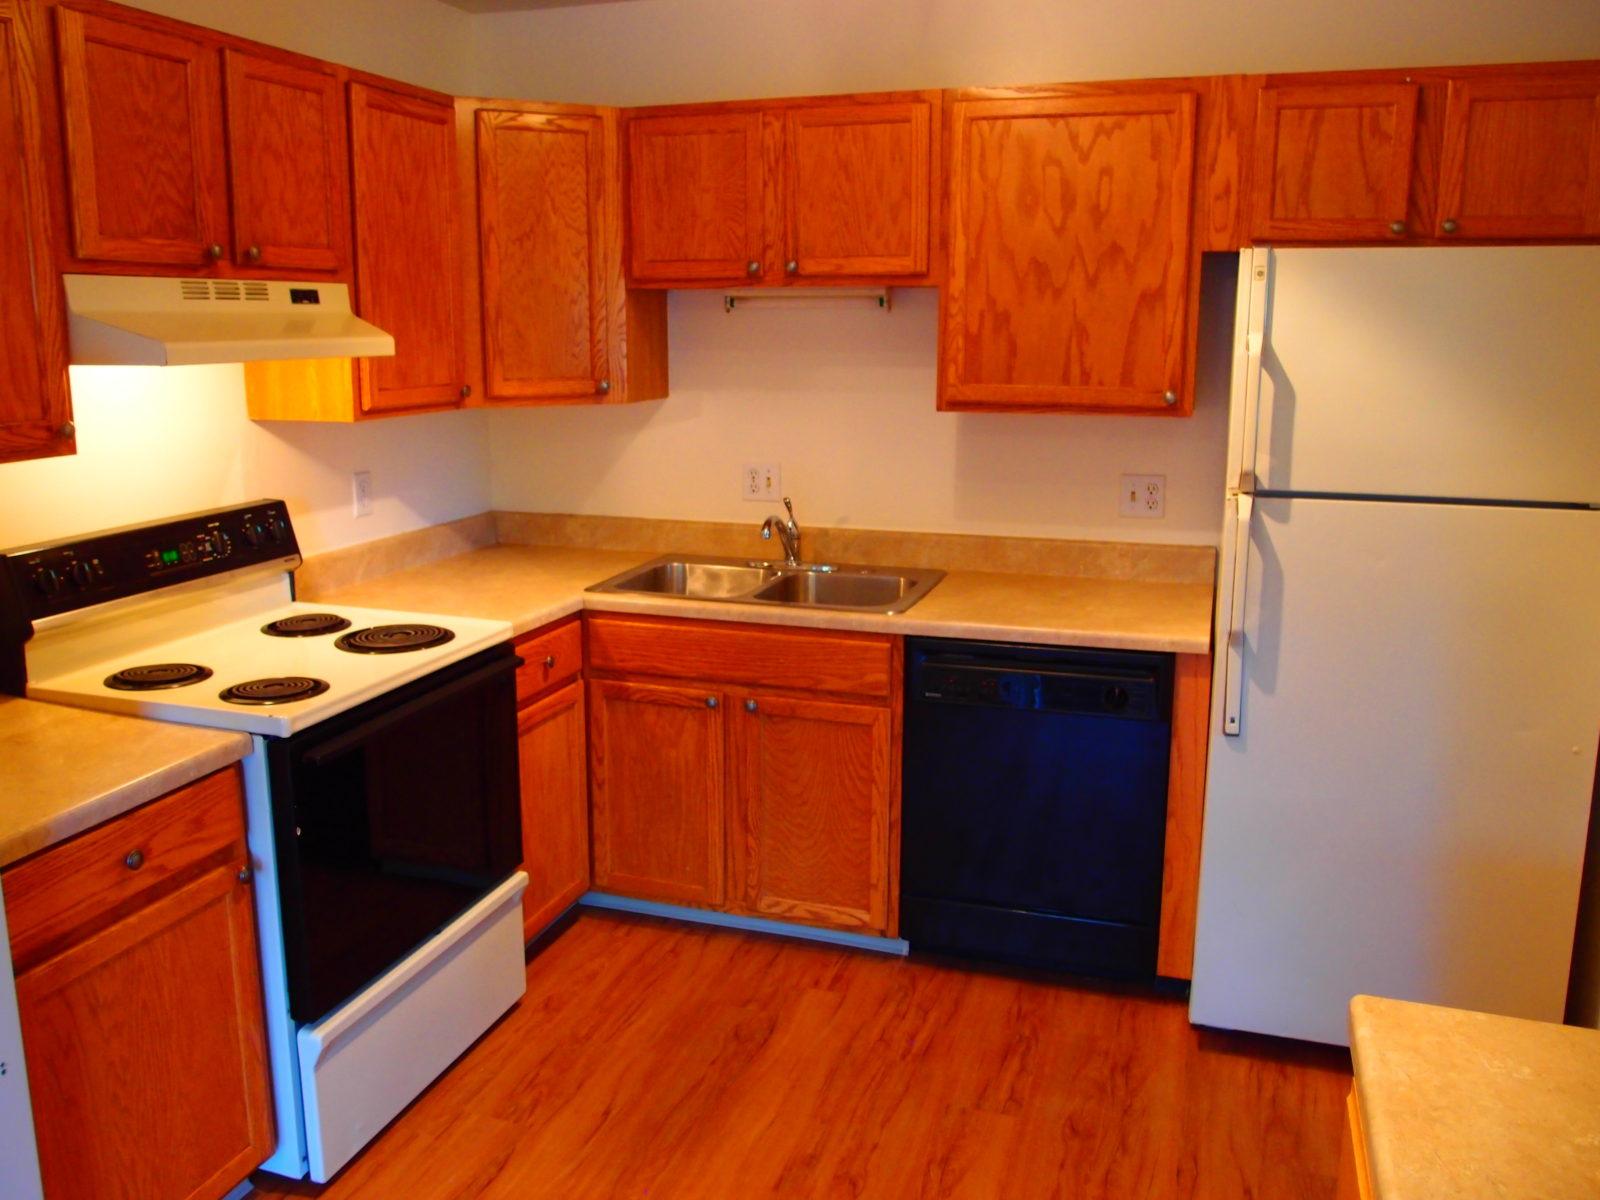 690 Kitchen Dishwasher